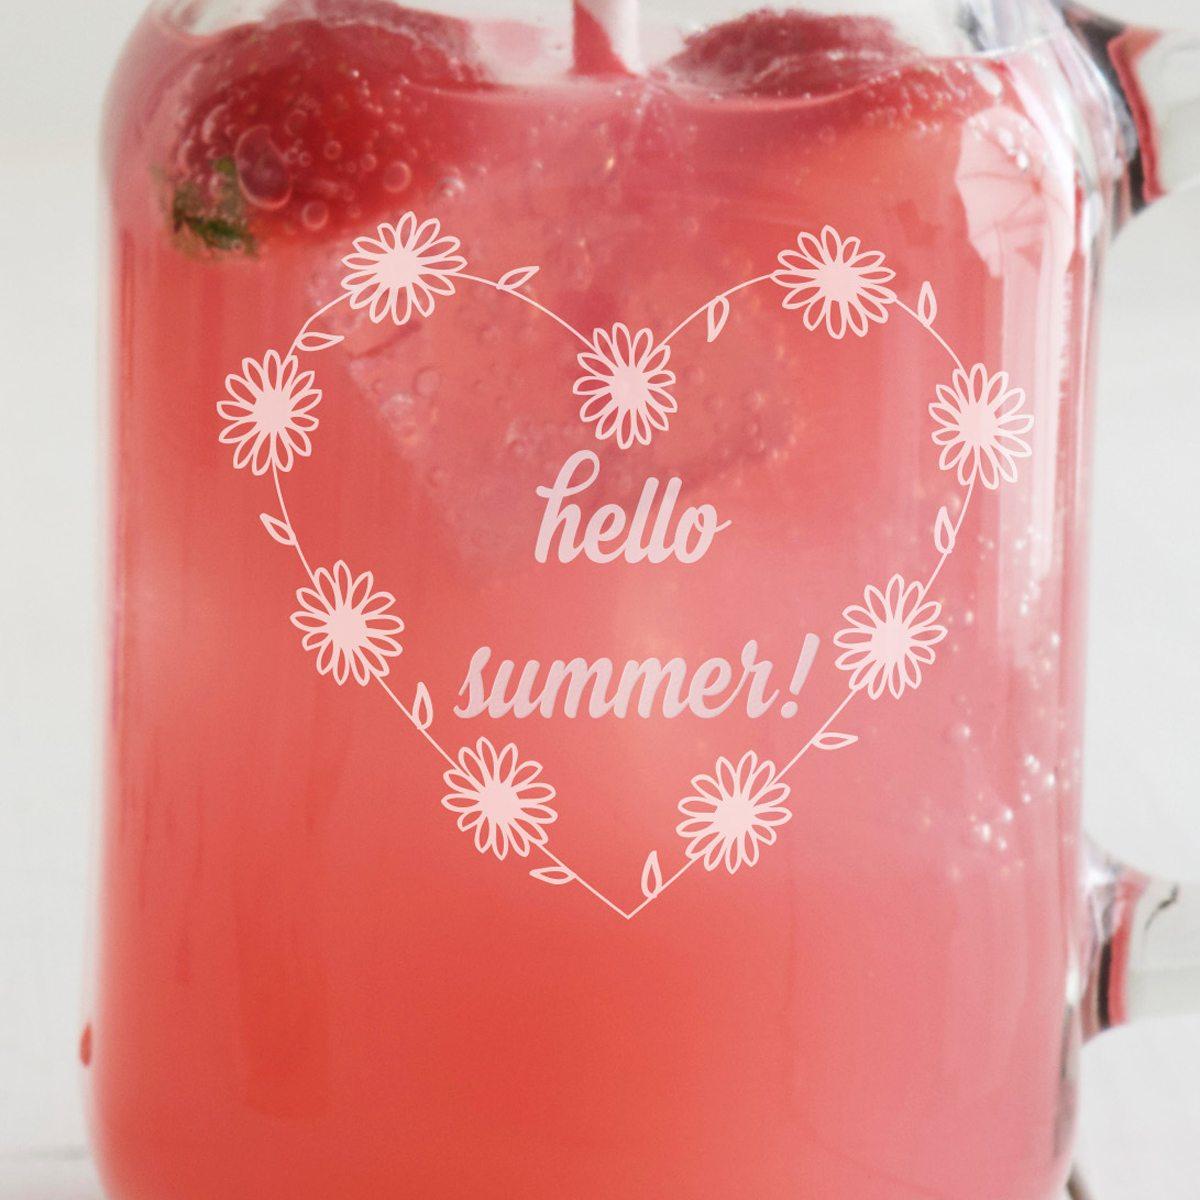 Personalised Daisy Heart Handled Drinking Jar